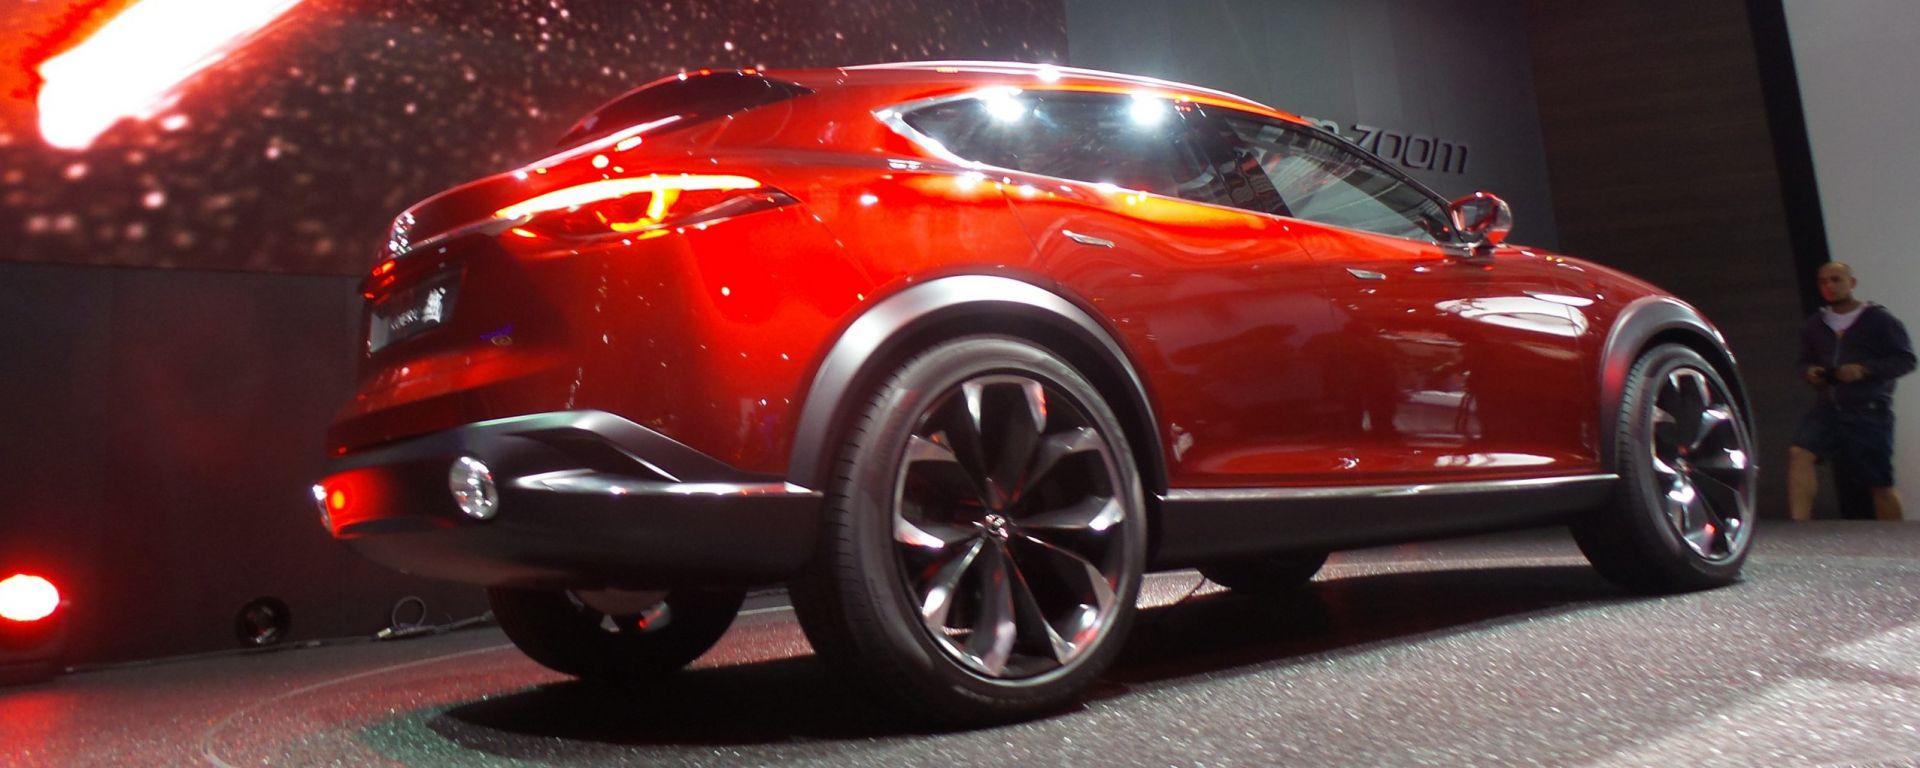 IAA Francoforte 2015: che stile, la Mazda Koeru